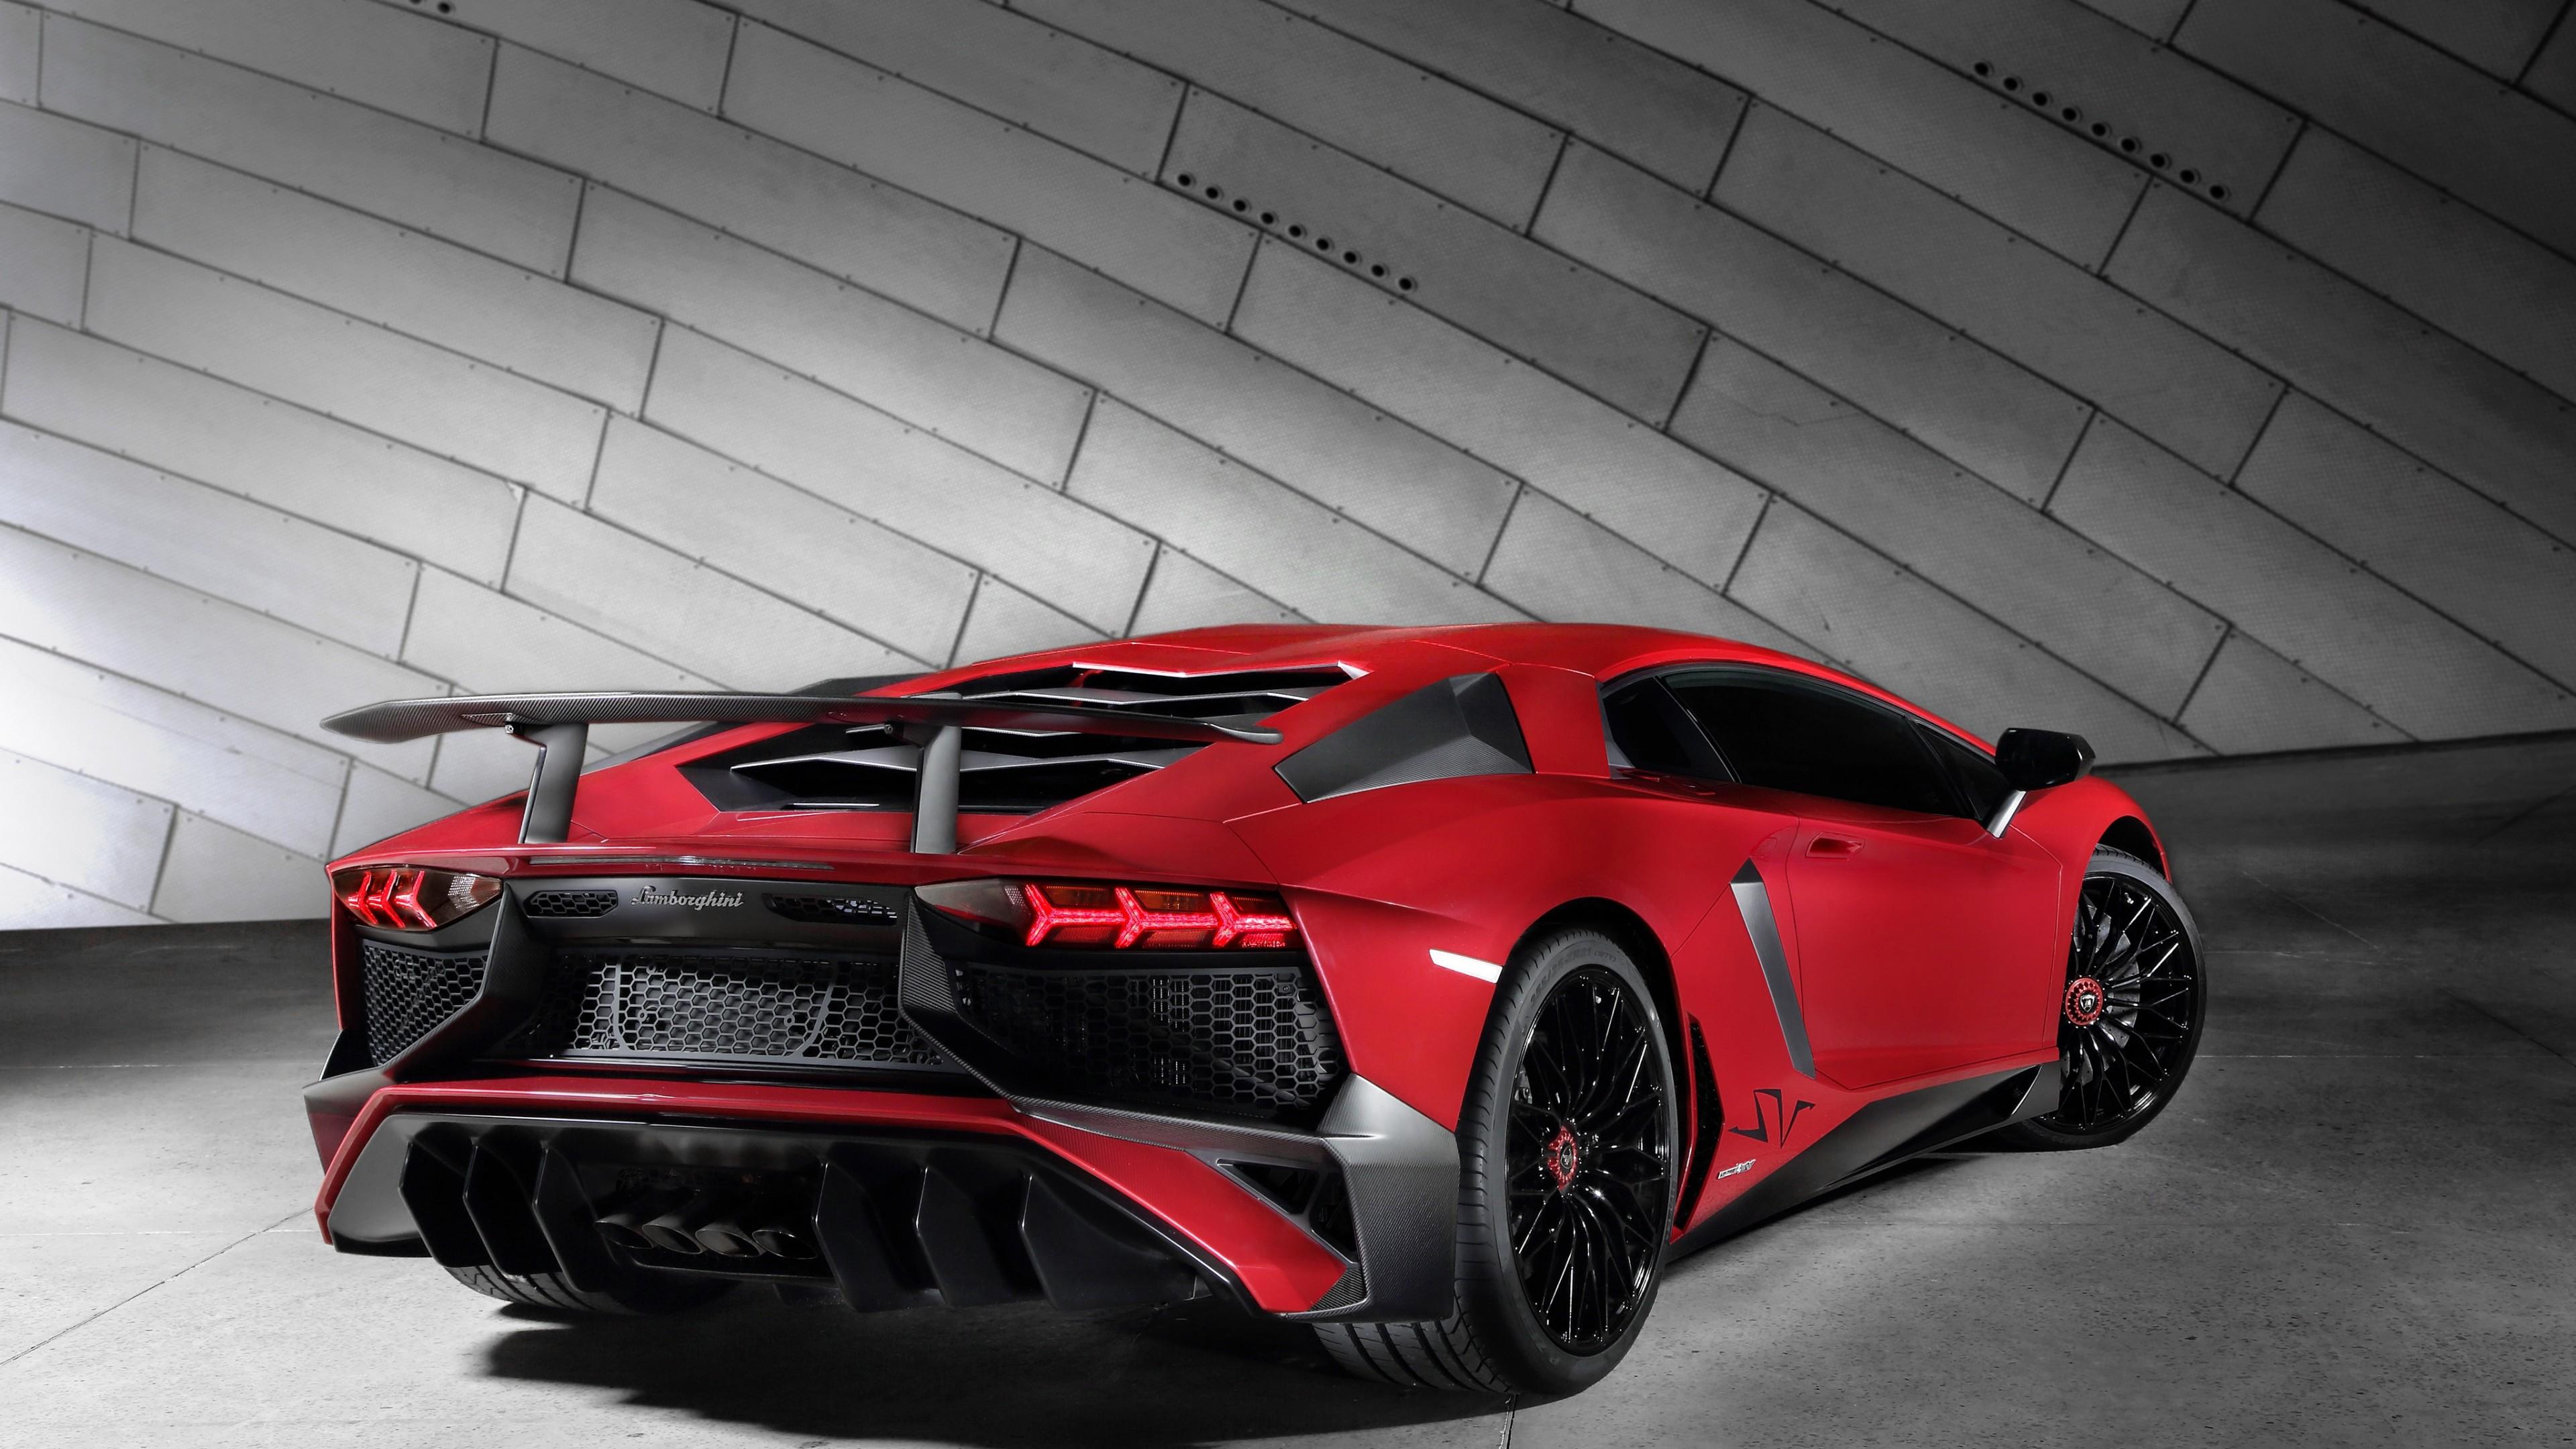 Red Lamborghini Veneno Wallpaper Hd Ultra Desktop Image